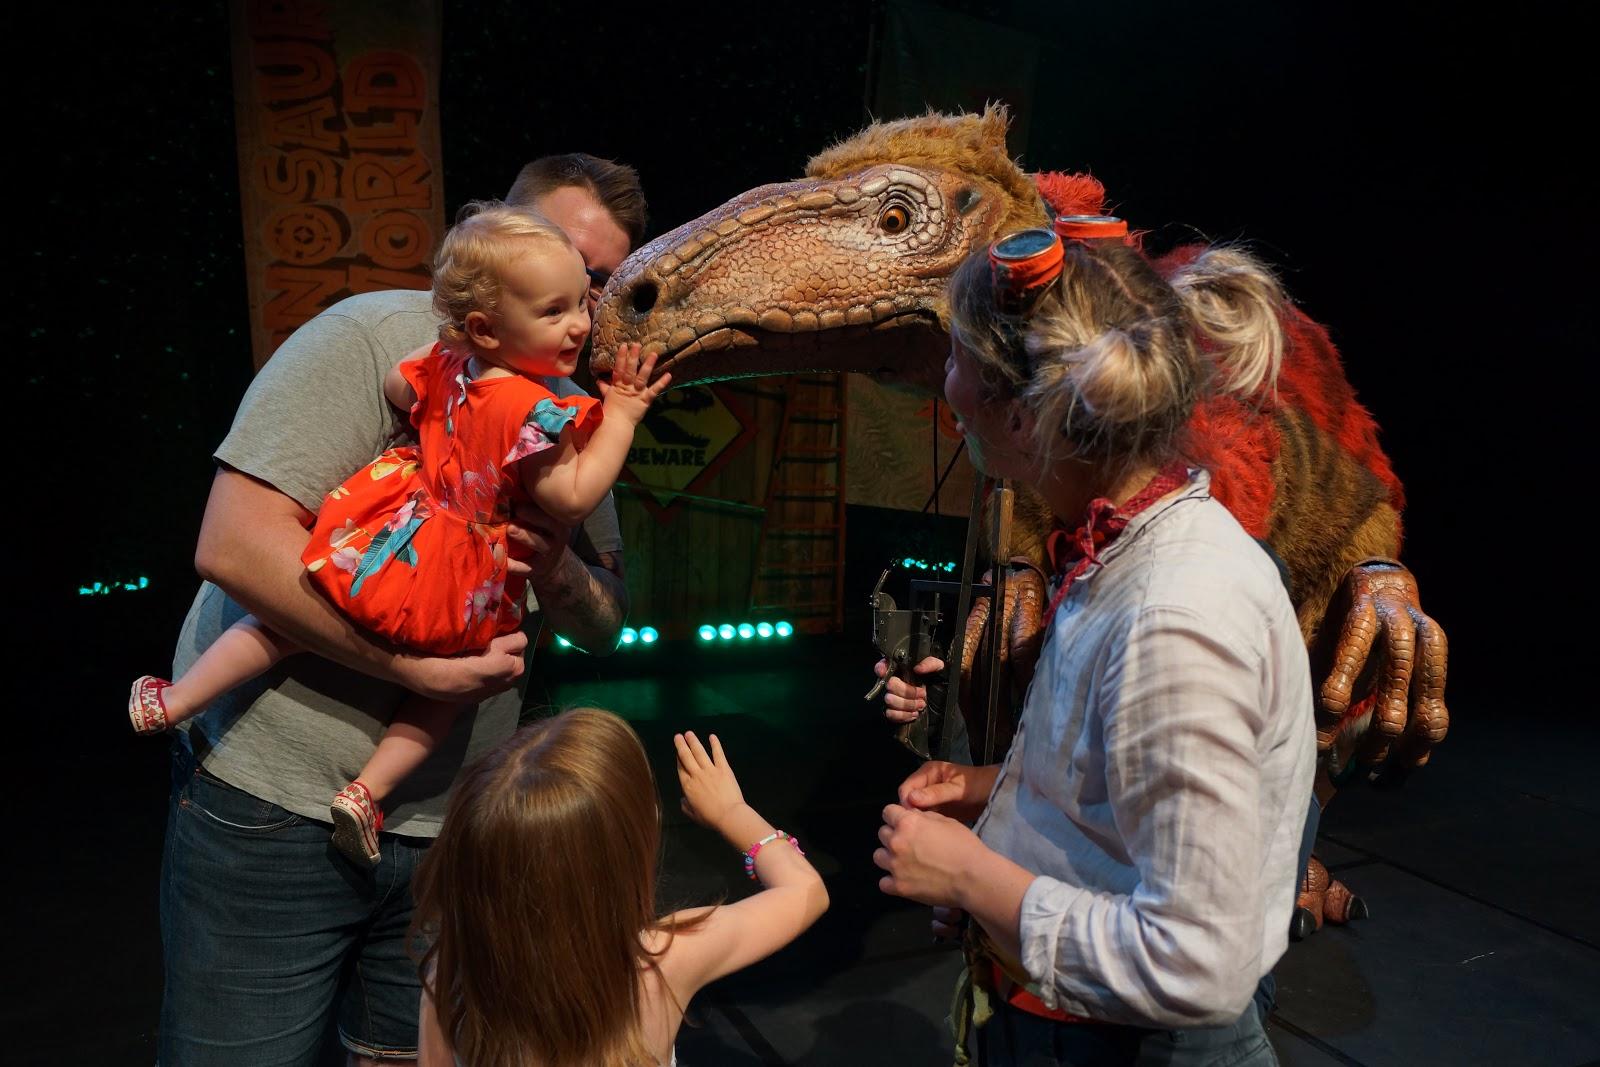 petting a dinosaur